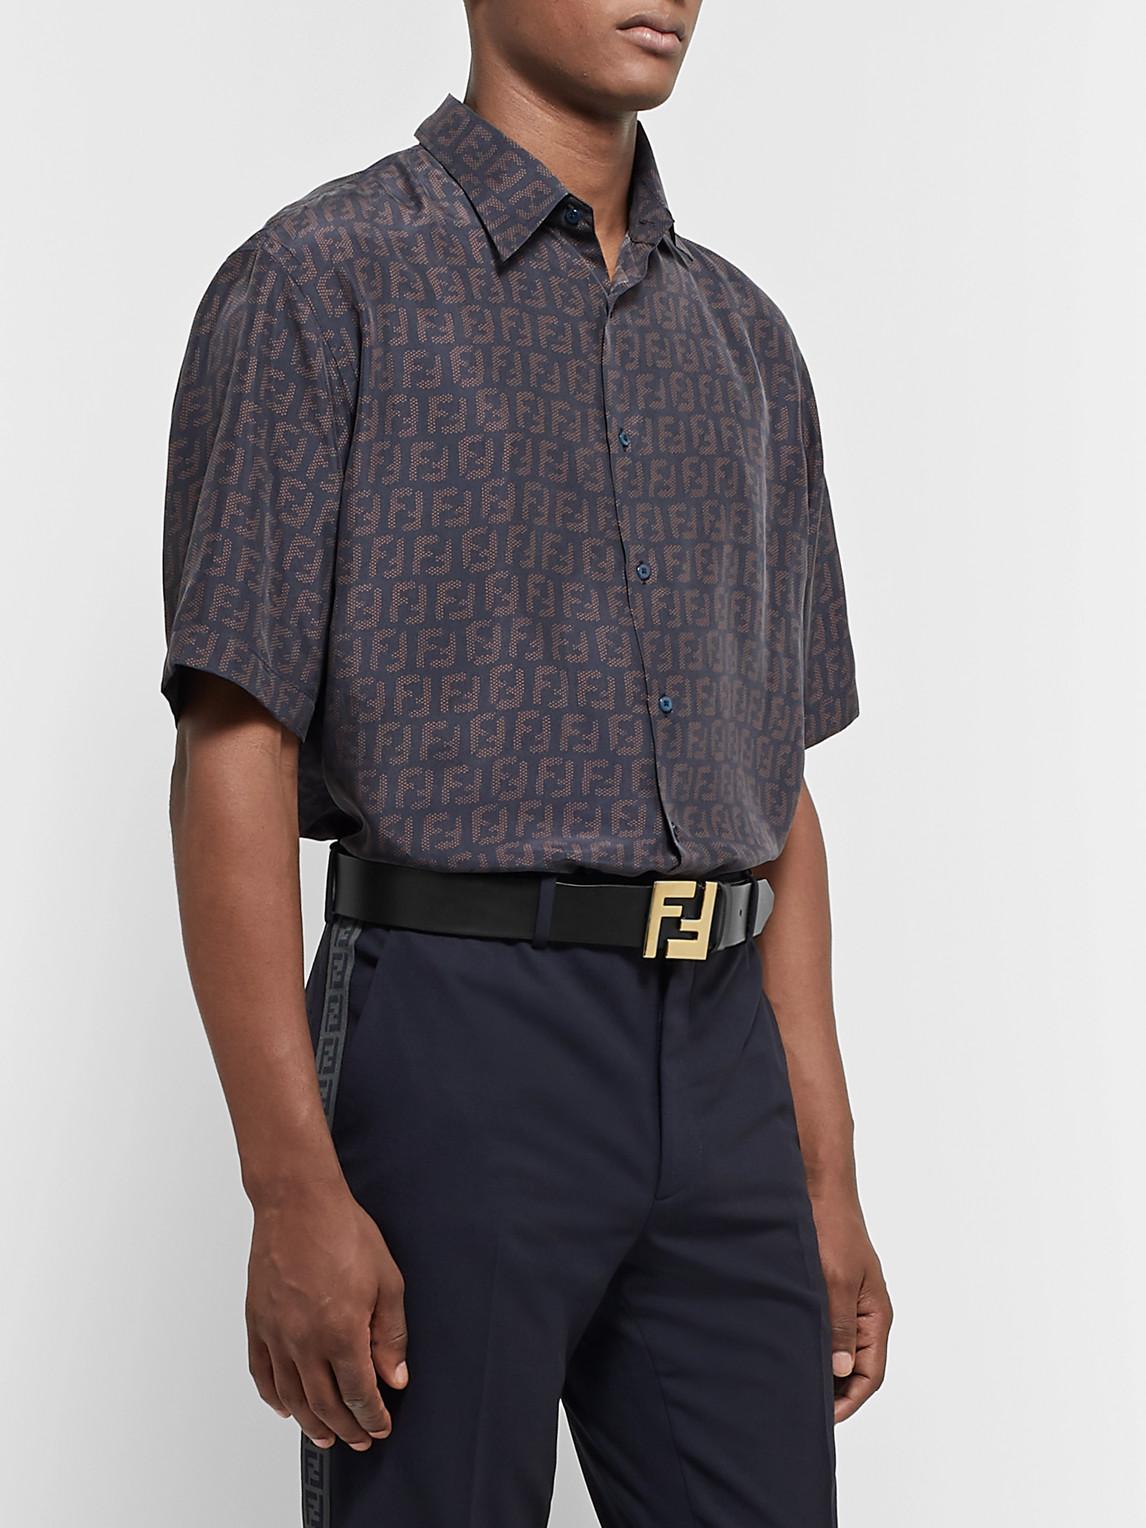 Fendi Belts 3.5CM BLACK LEATHER BELT